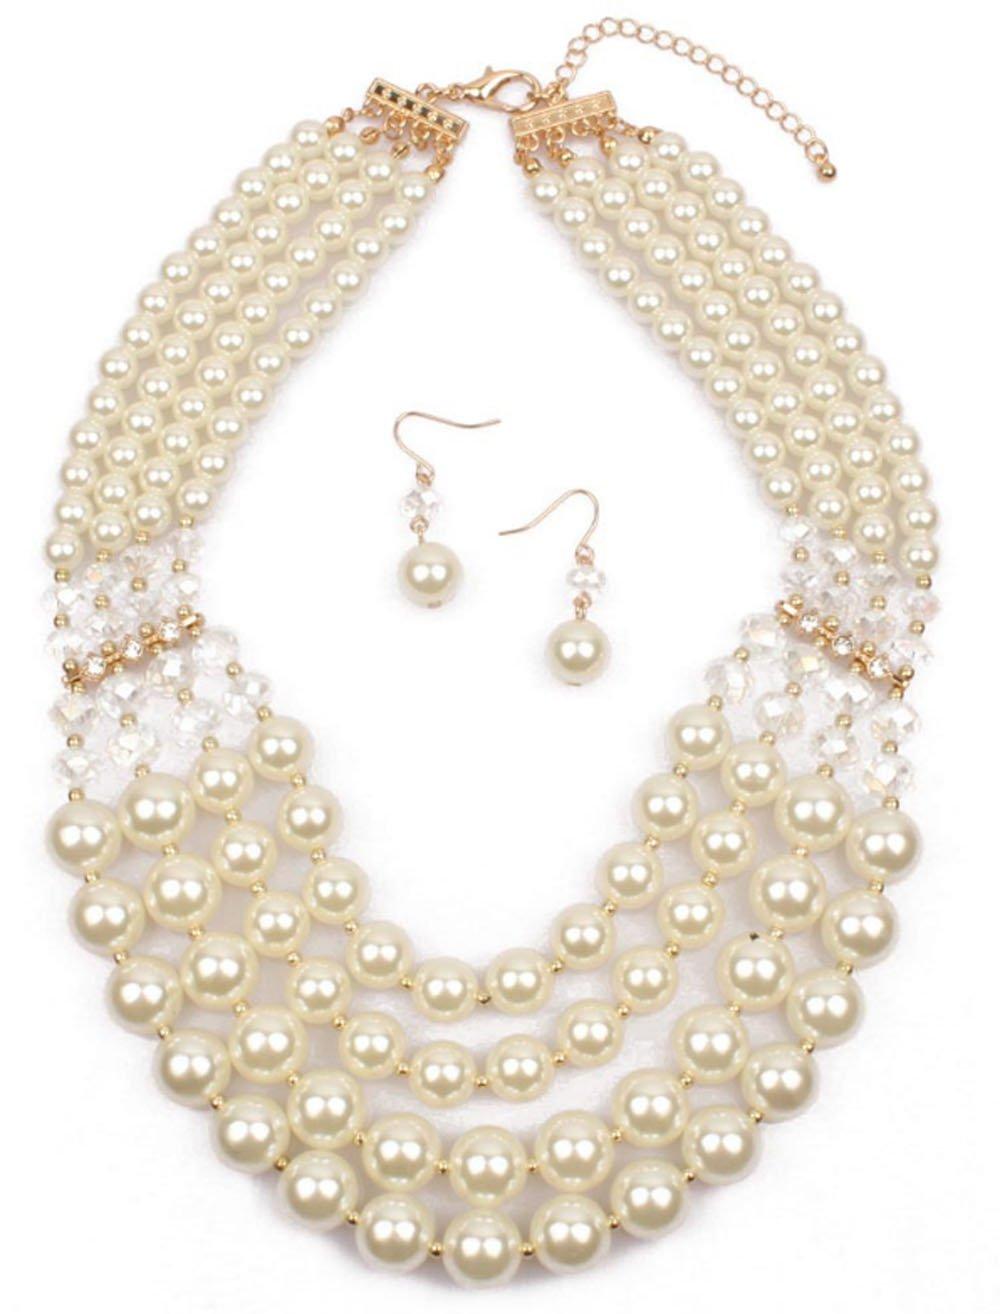 Shineland Elegant Multi-Strand Pearl Glass Crystal Cluster Collar Bib Choker Necklace EarringSets (4 Layered White)